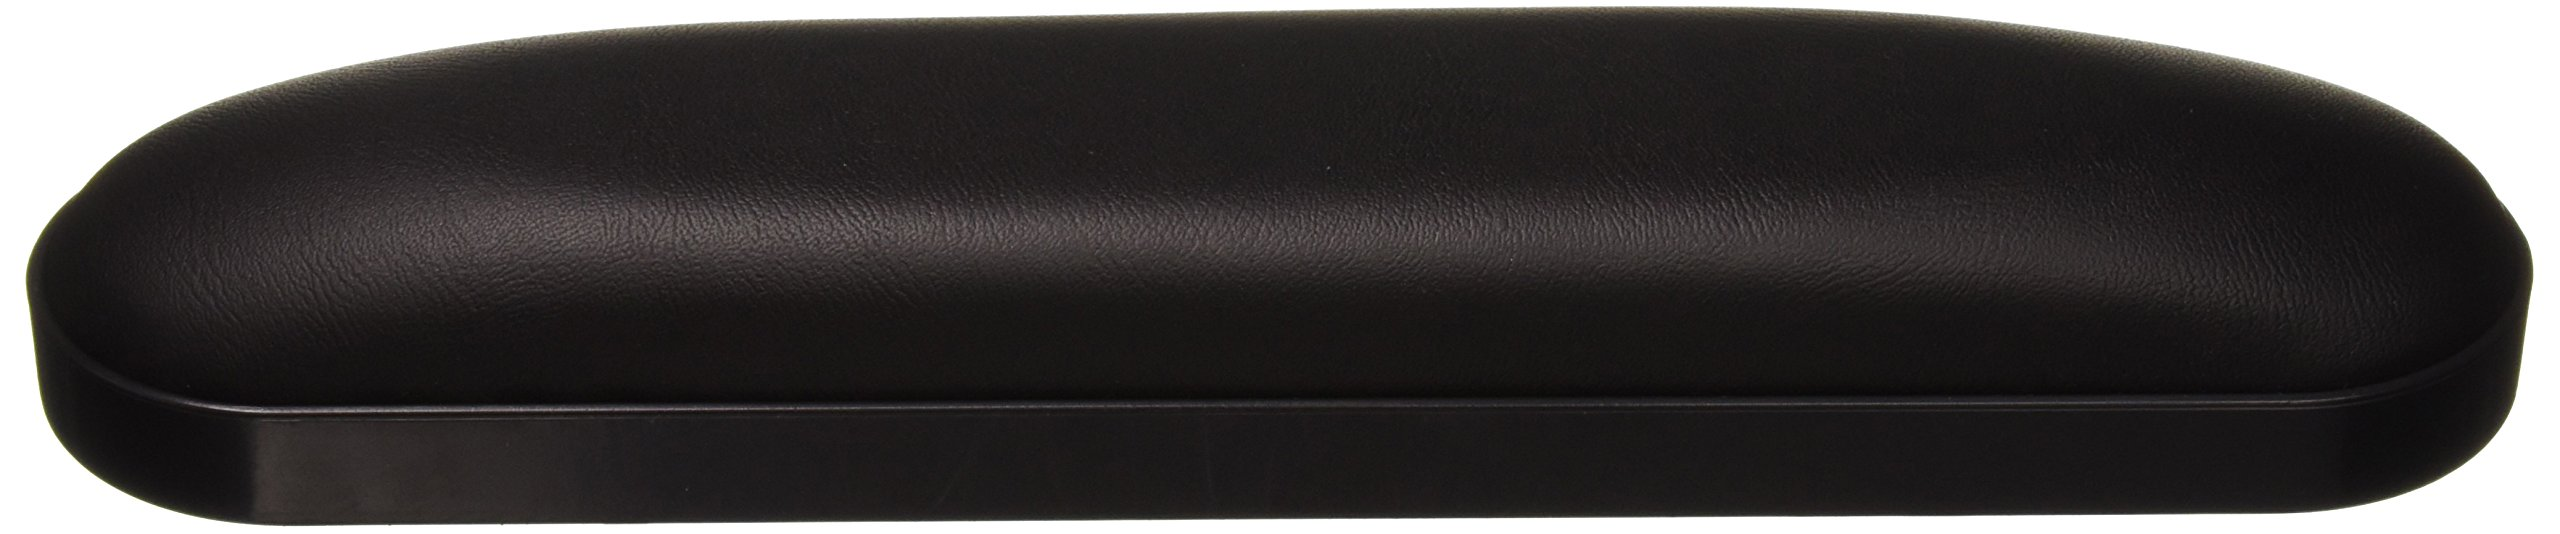 Karman Healthcare Desk Length Black Armpad for Wheelchair, 1 Pound